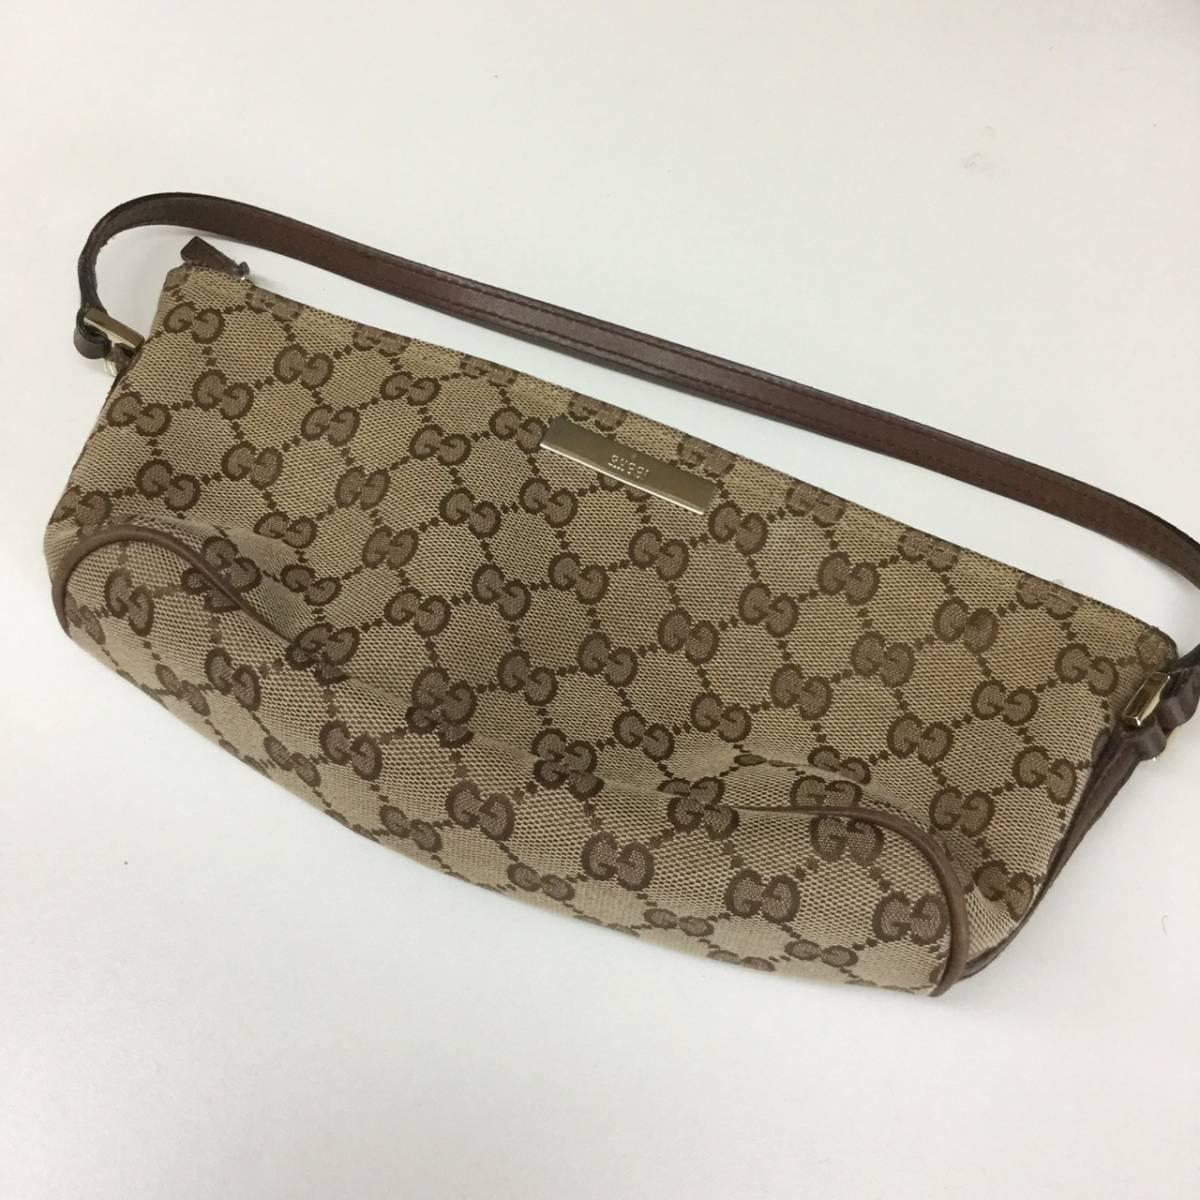 c190ac002 GUCCI Gucci GG pattern canvas leather Mini handbag pouch baniti ...